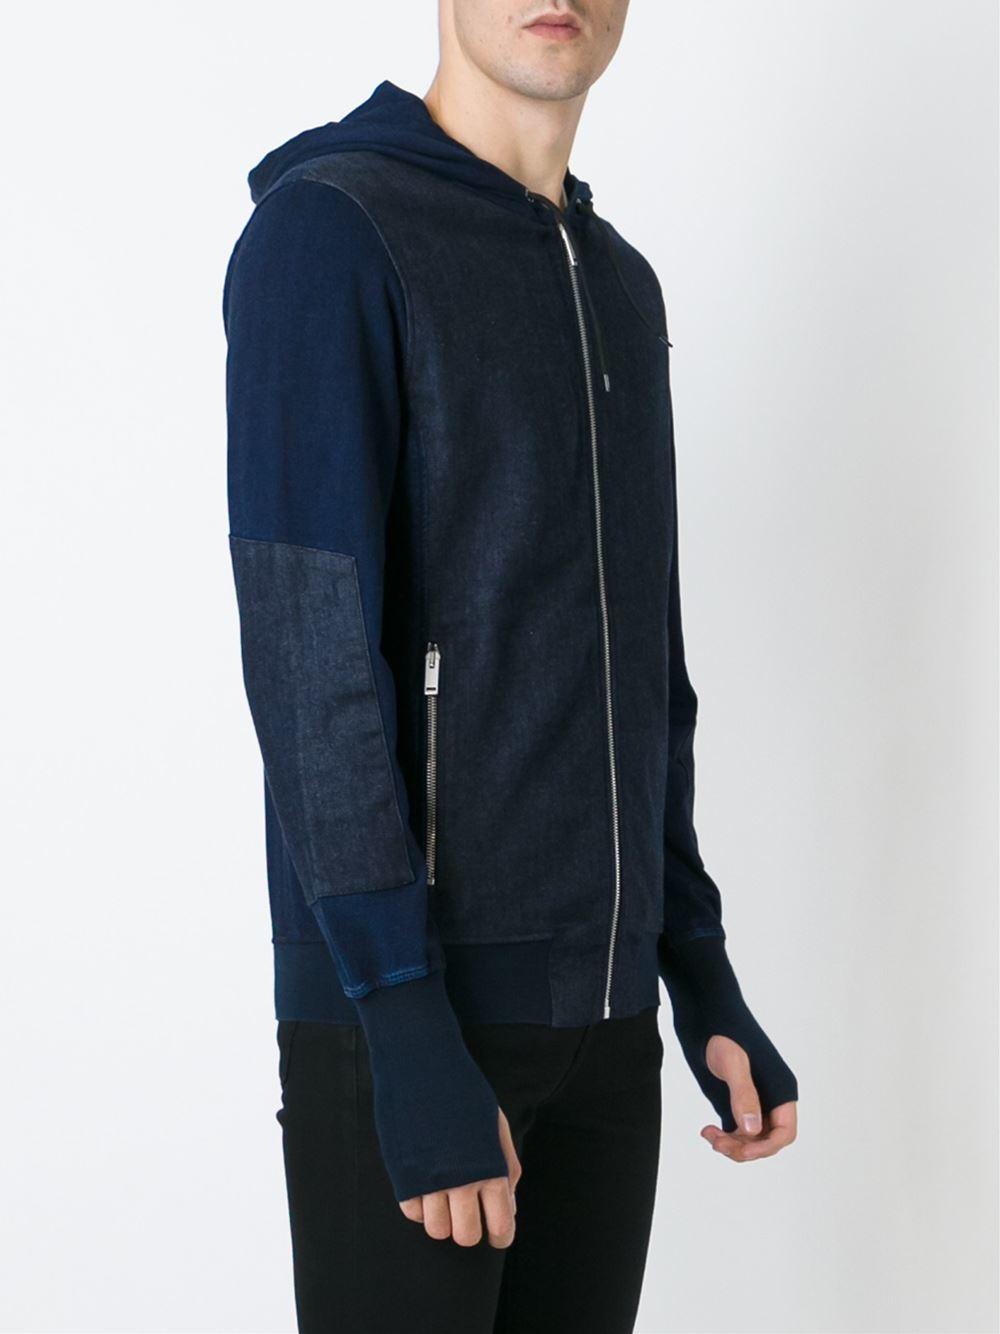 alexander mcqueen panelled hoodie in blue for men lyst. Black Bedroom Furniture Sets. Home Design Ideas